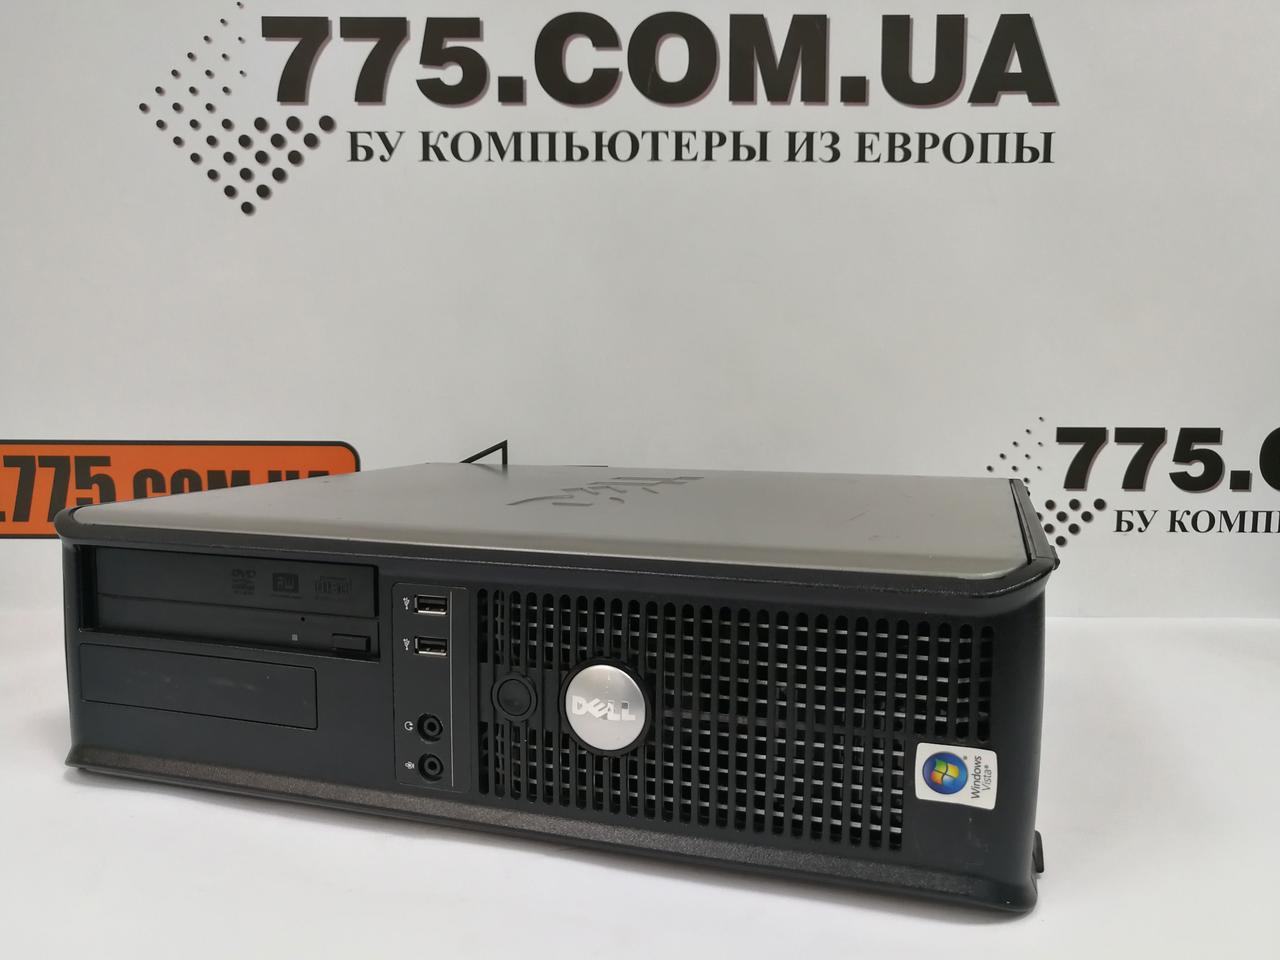 Компьютер Dell OptiPlex 755 (SFF-Desktop), Intel Pentium E5800 3.2GHz, RAM 2ГБ, HDD 160ГБ